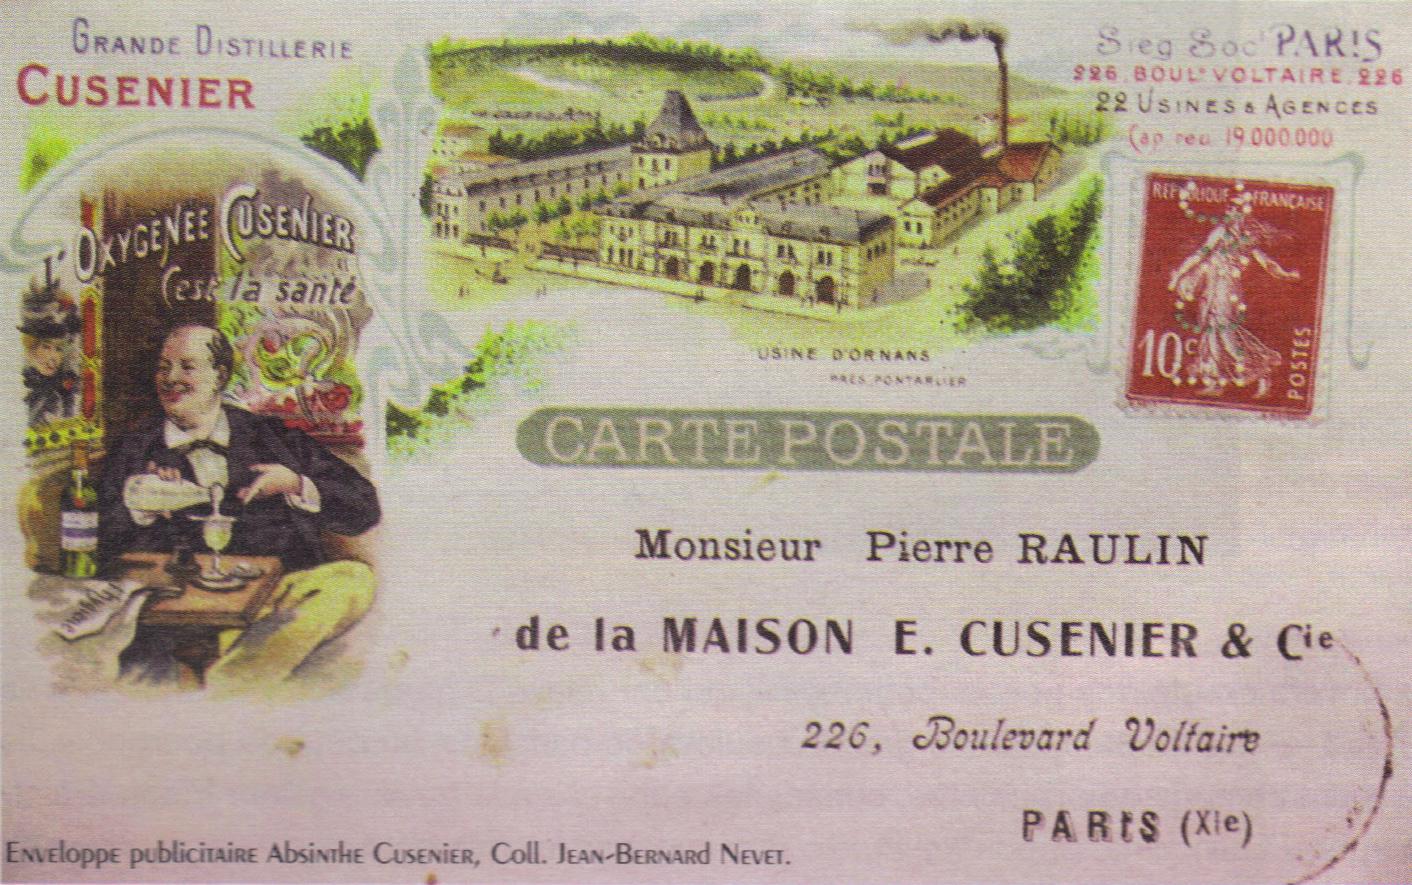 Enveloppe publicitaire absinthe Cusenier